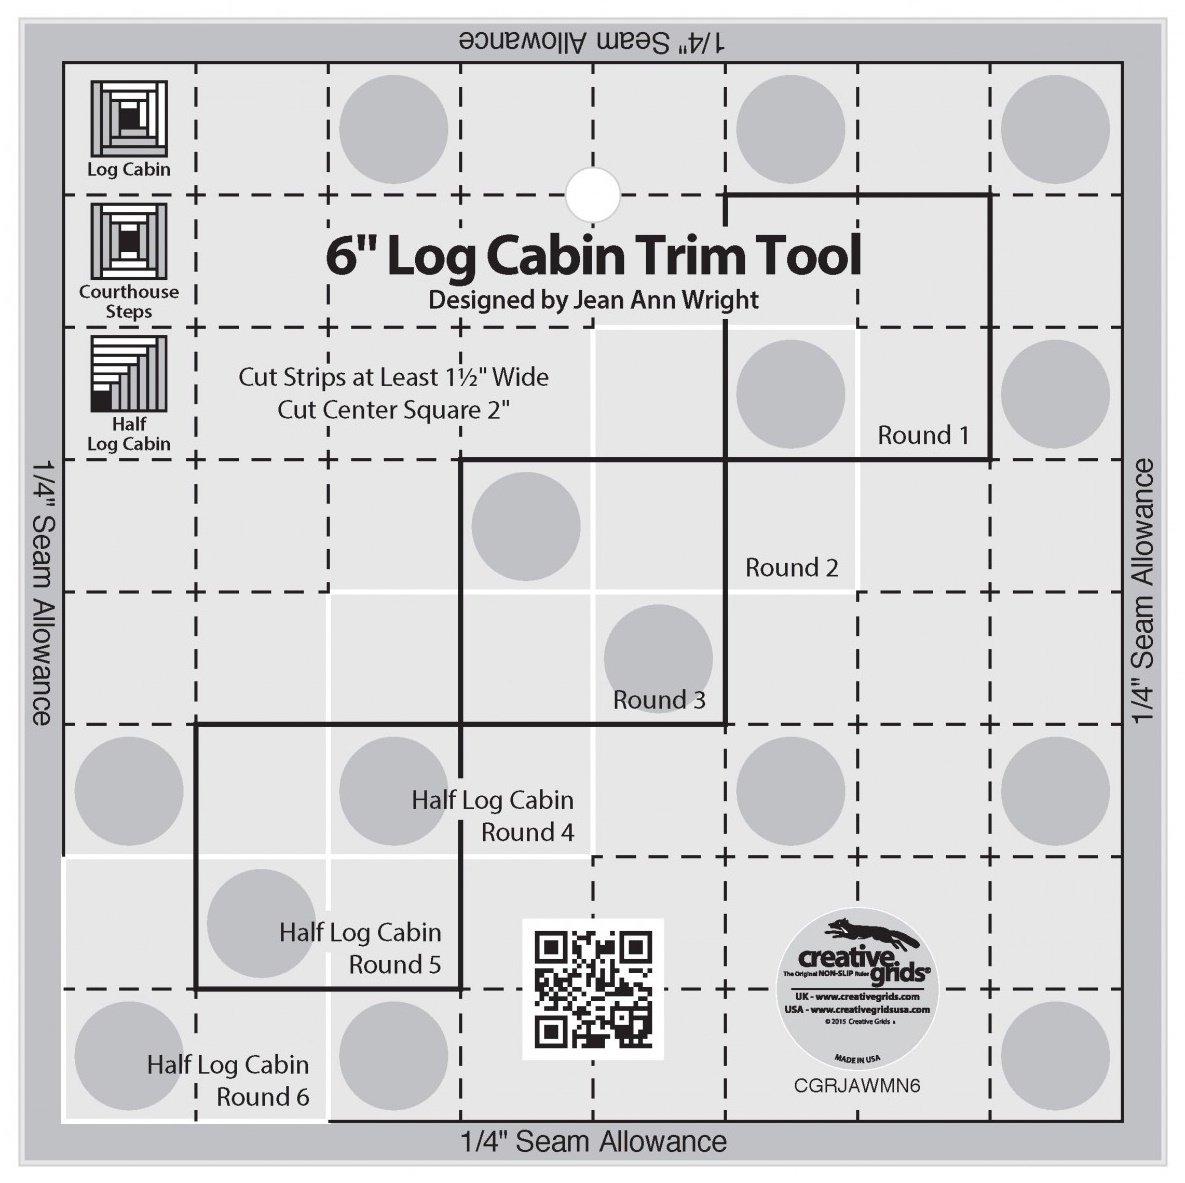 Creative Grids 6 Log Cabin Trim Tool